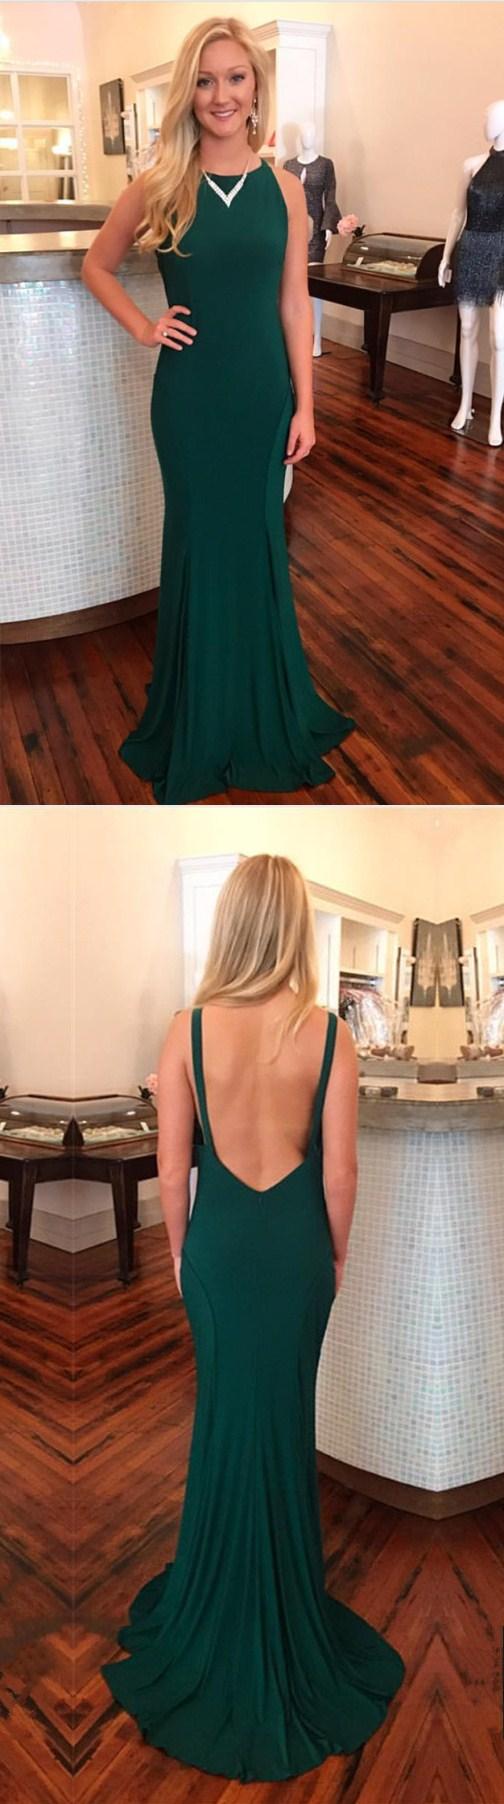 Prom dresslong prom dress open backlong prom dress mermaid dark